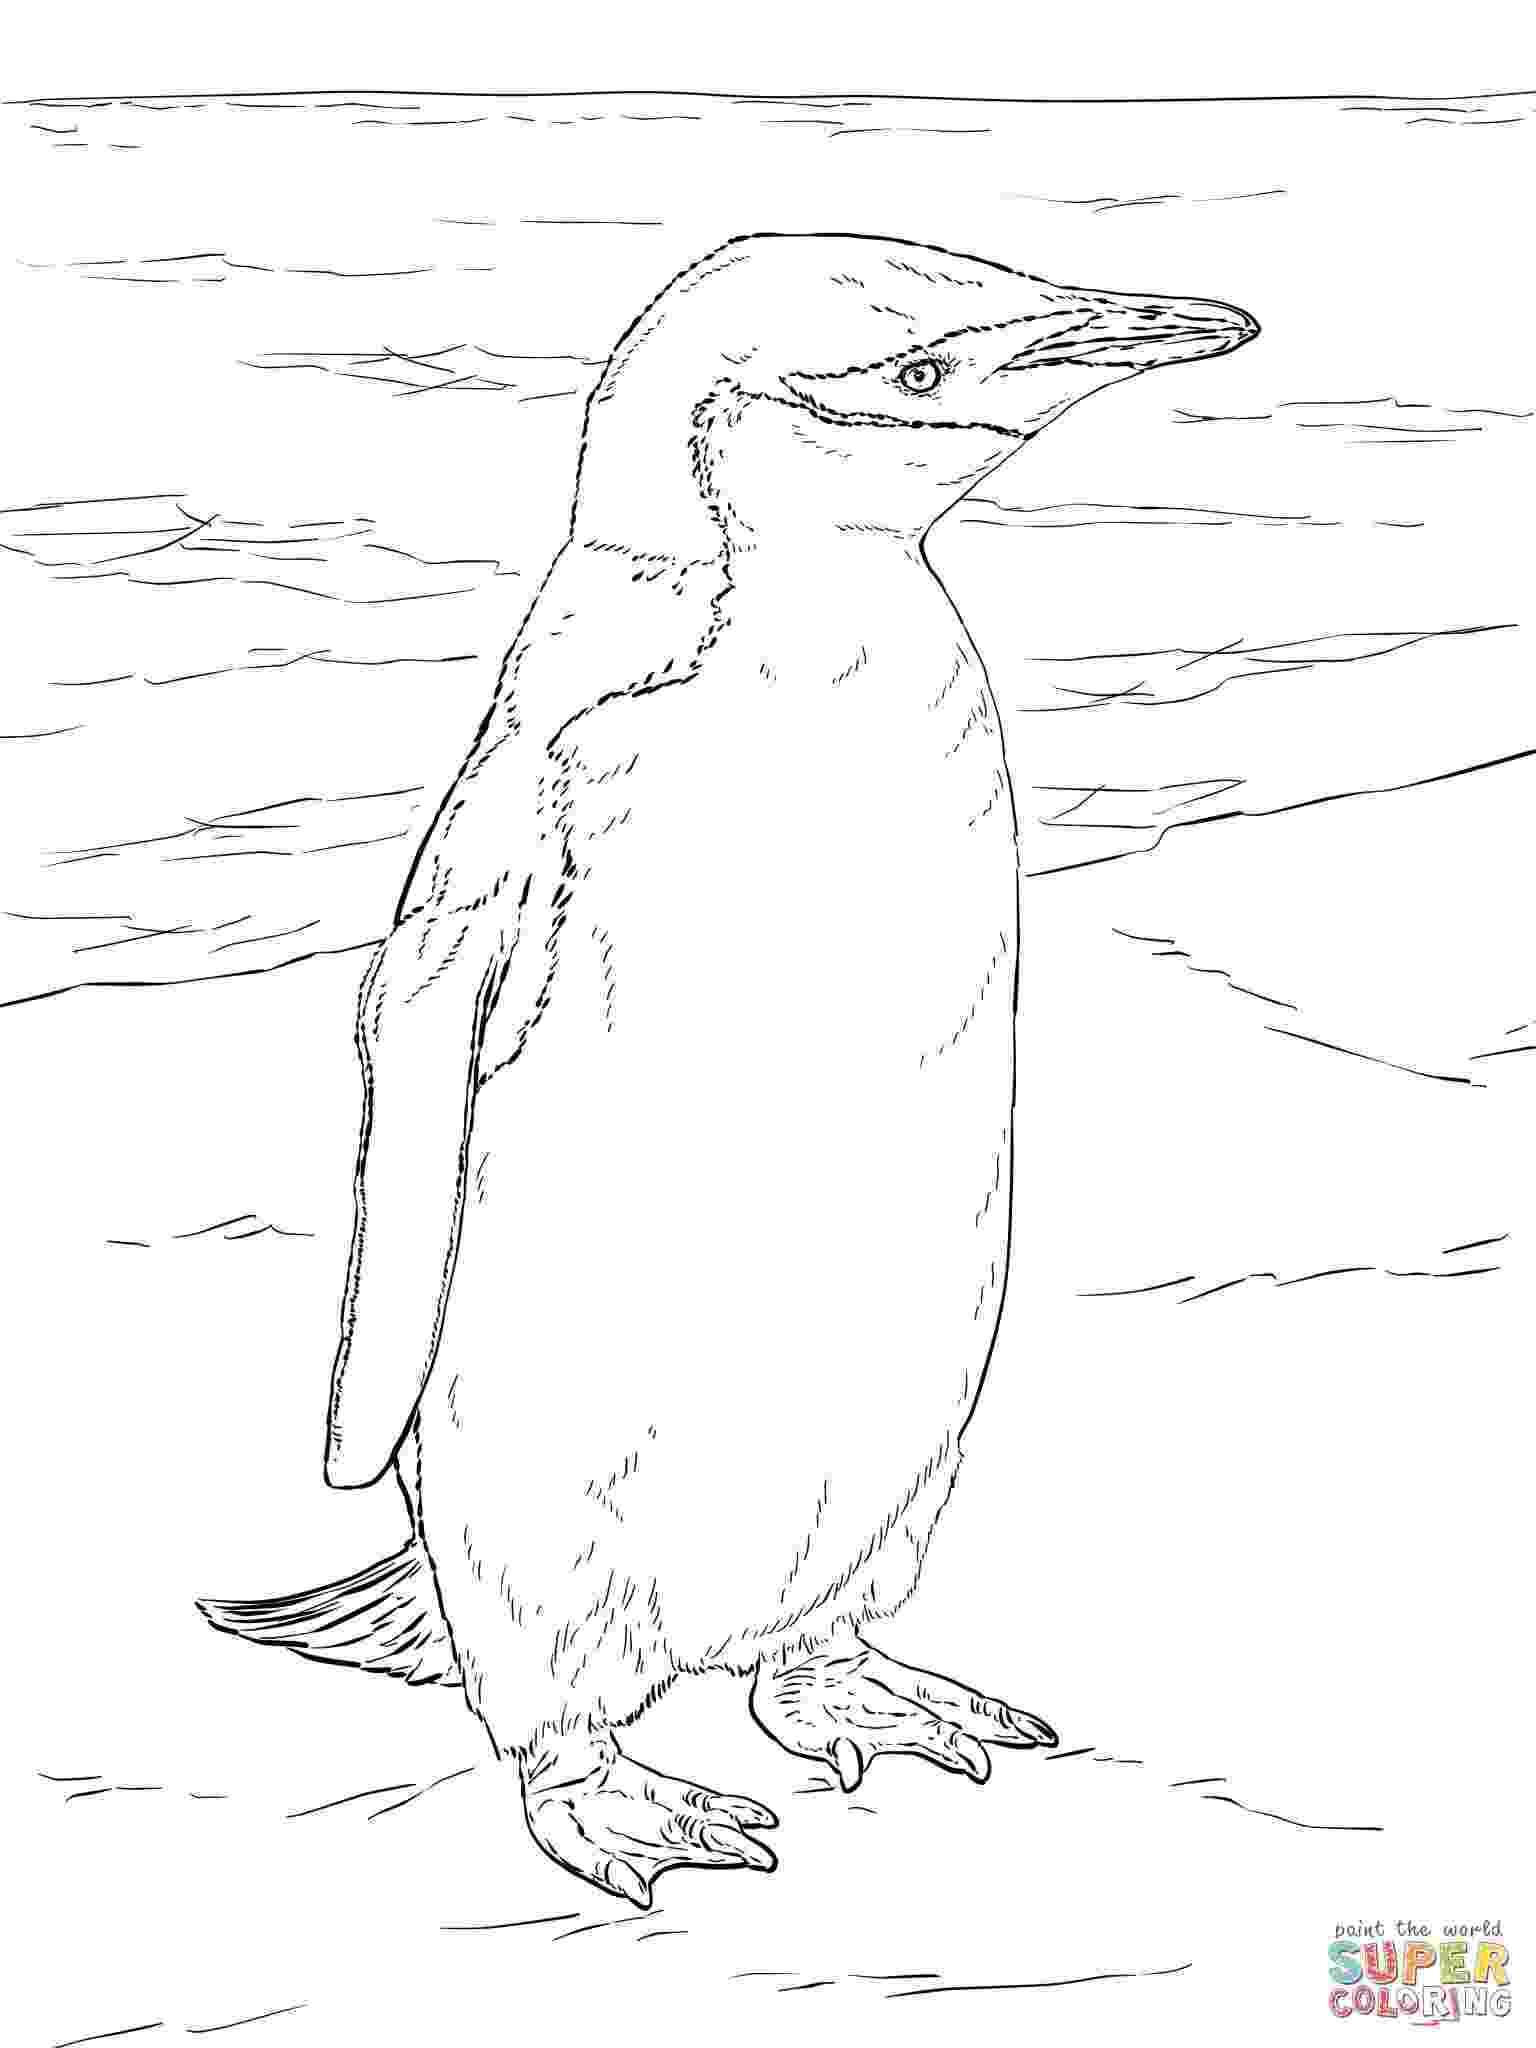 antarctica coloring page antarctica coloring page at getcoloringscom free coloring antarctica page